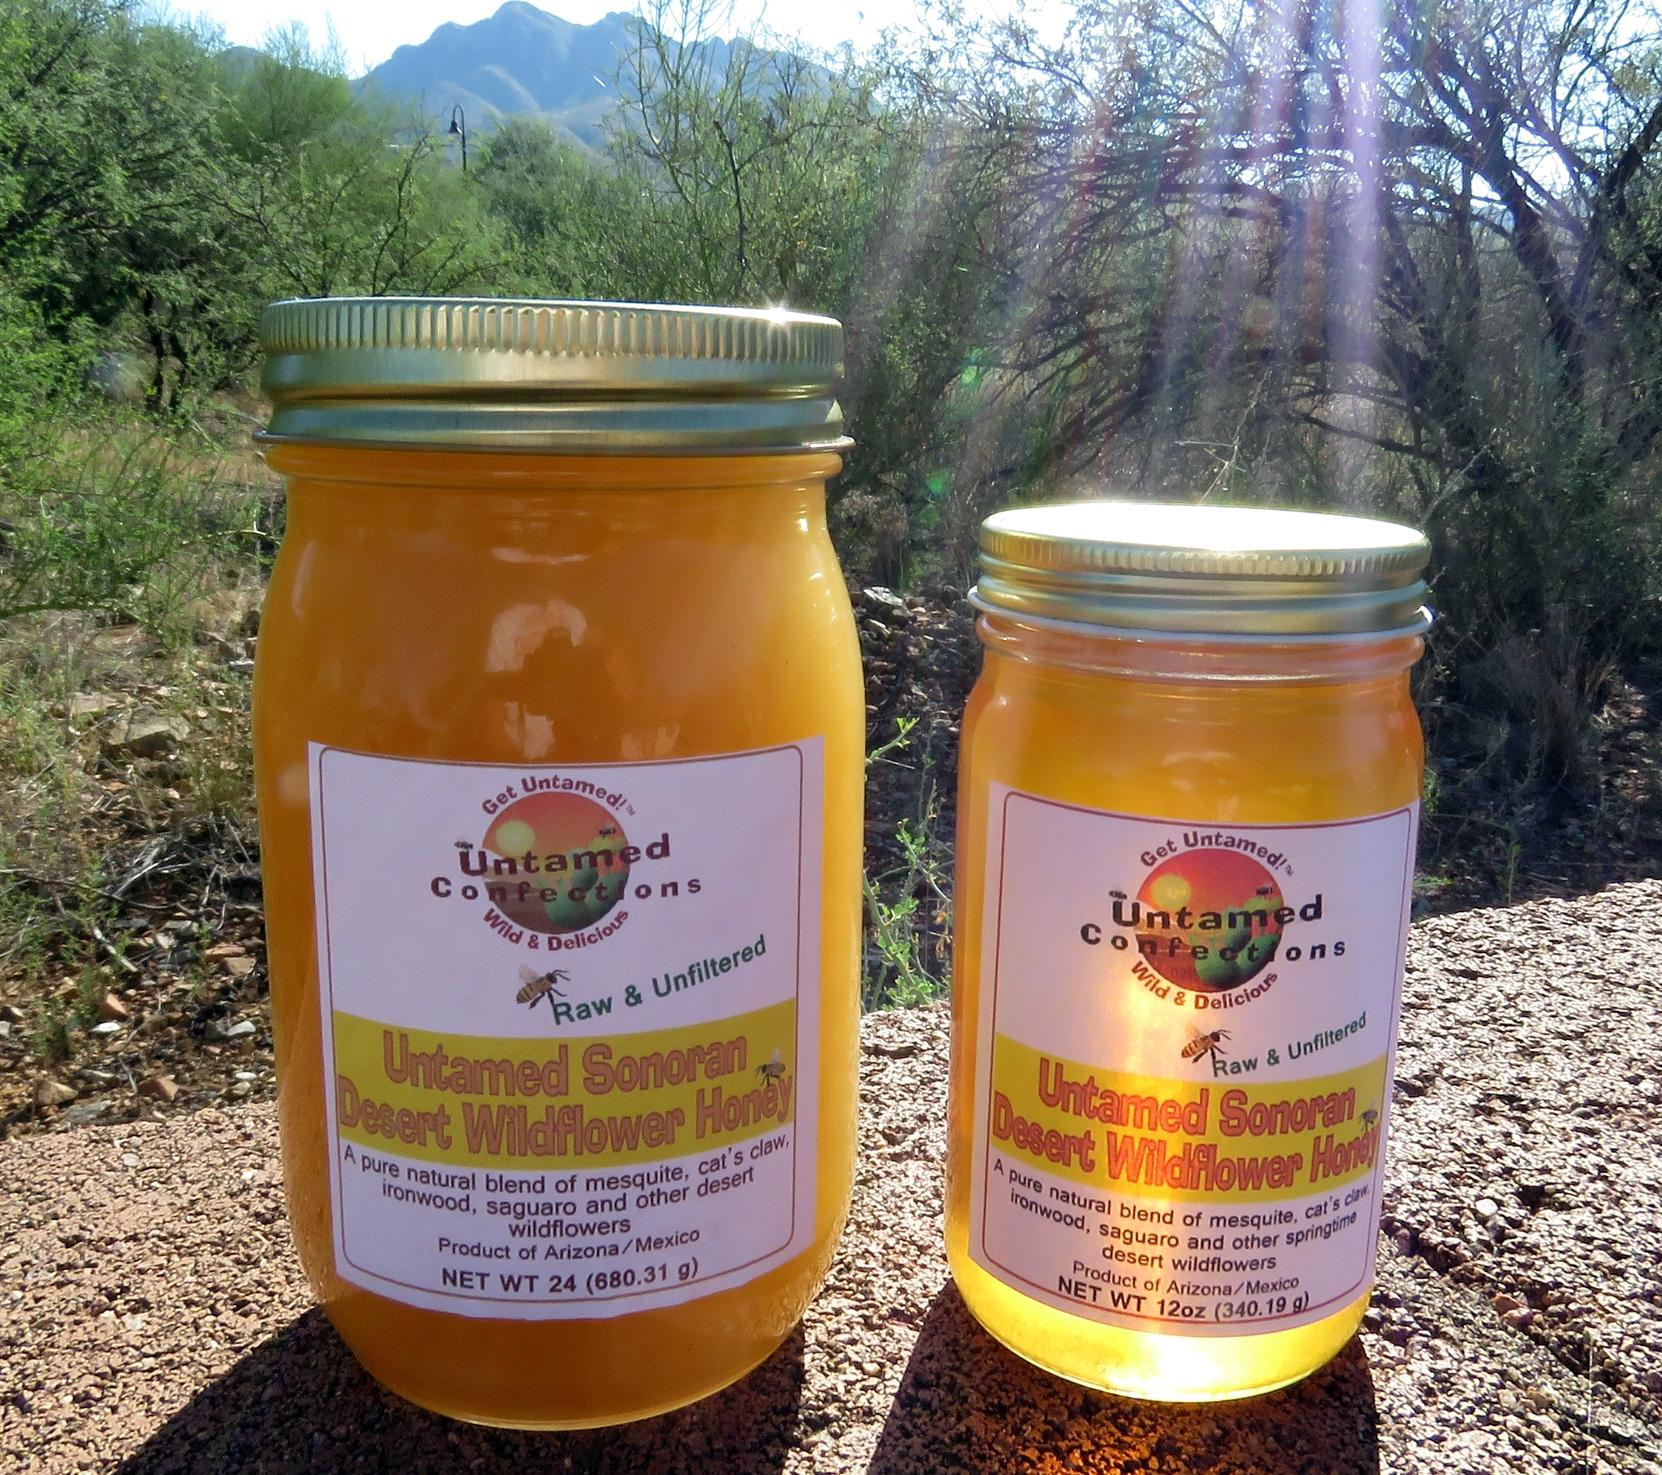 Sonoran Desert Wildflower Honey